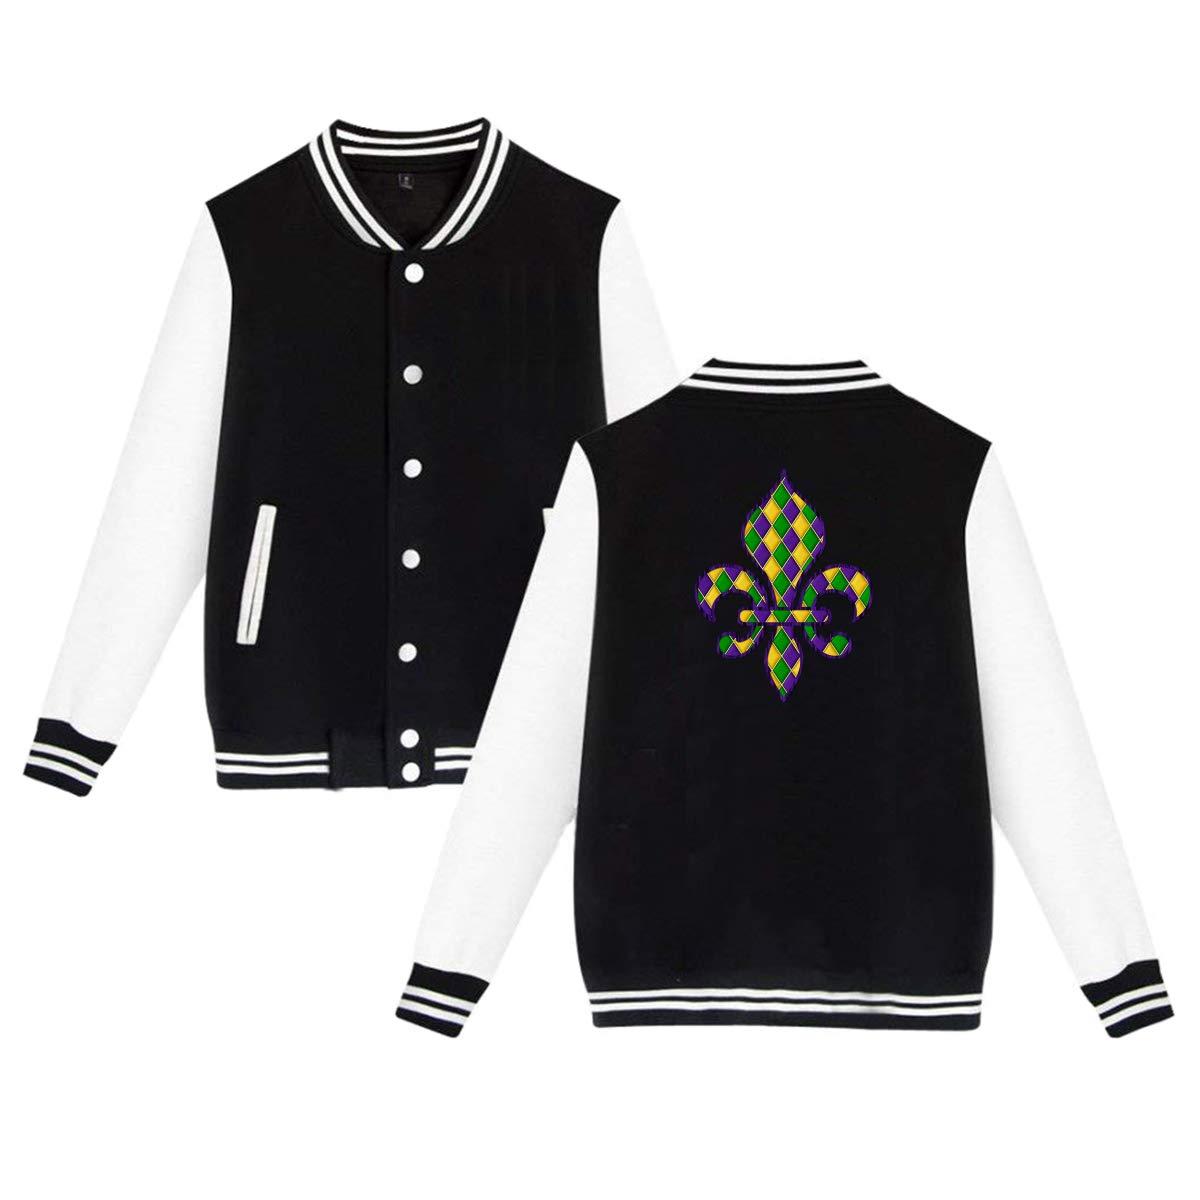 Mardi Gras Fleur De Lis Baseball Jacket Uniform Unisex Sweater Coat